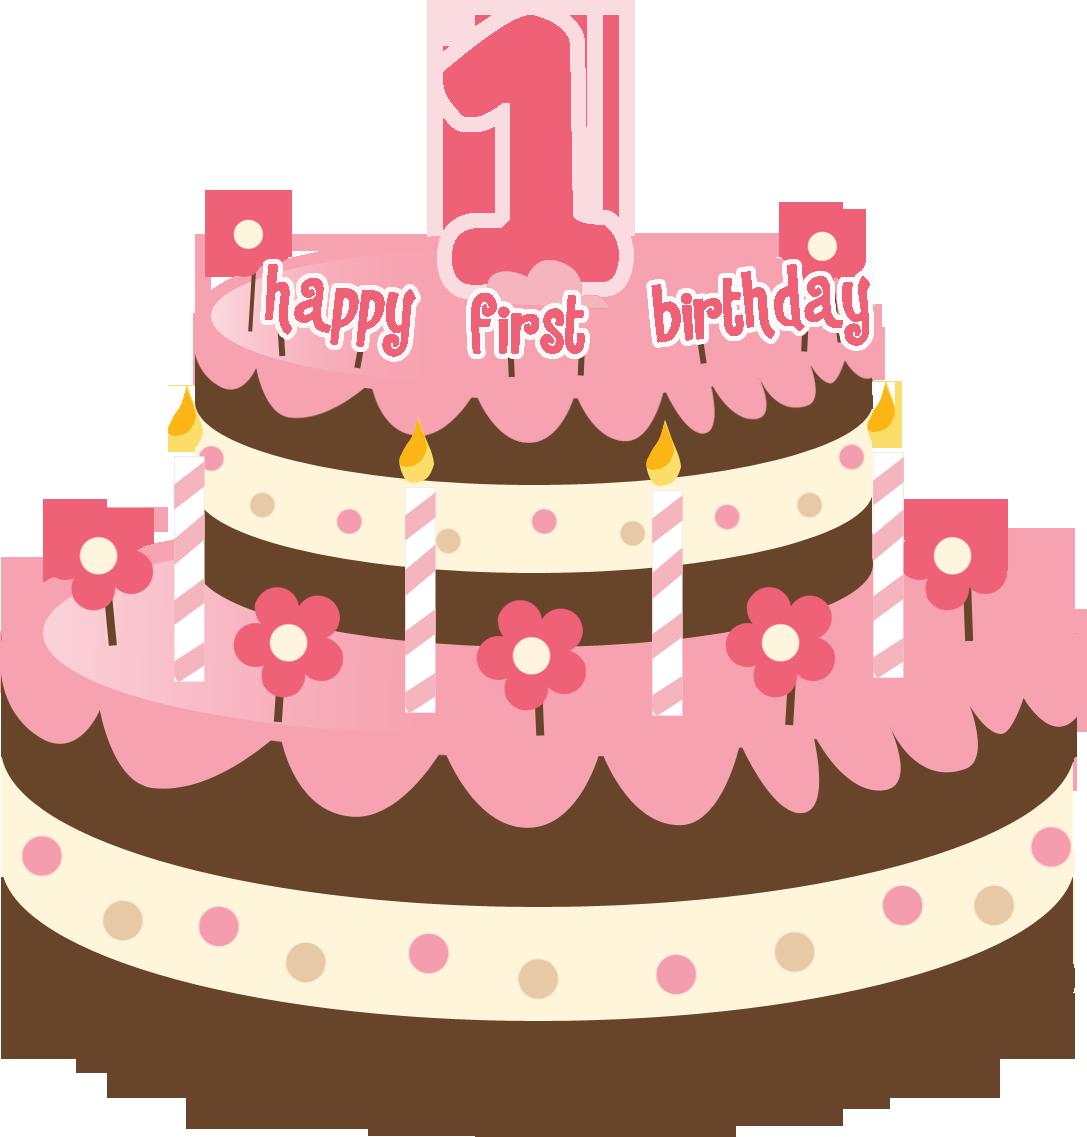 First Birthday Cake Clip Art Birthday Cake Clip Art...